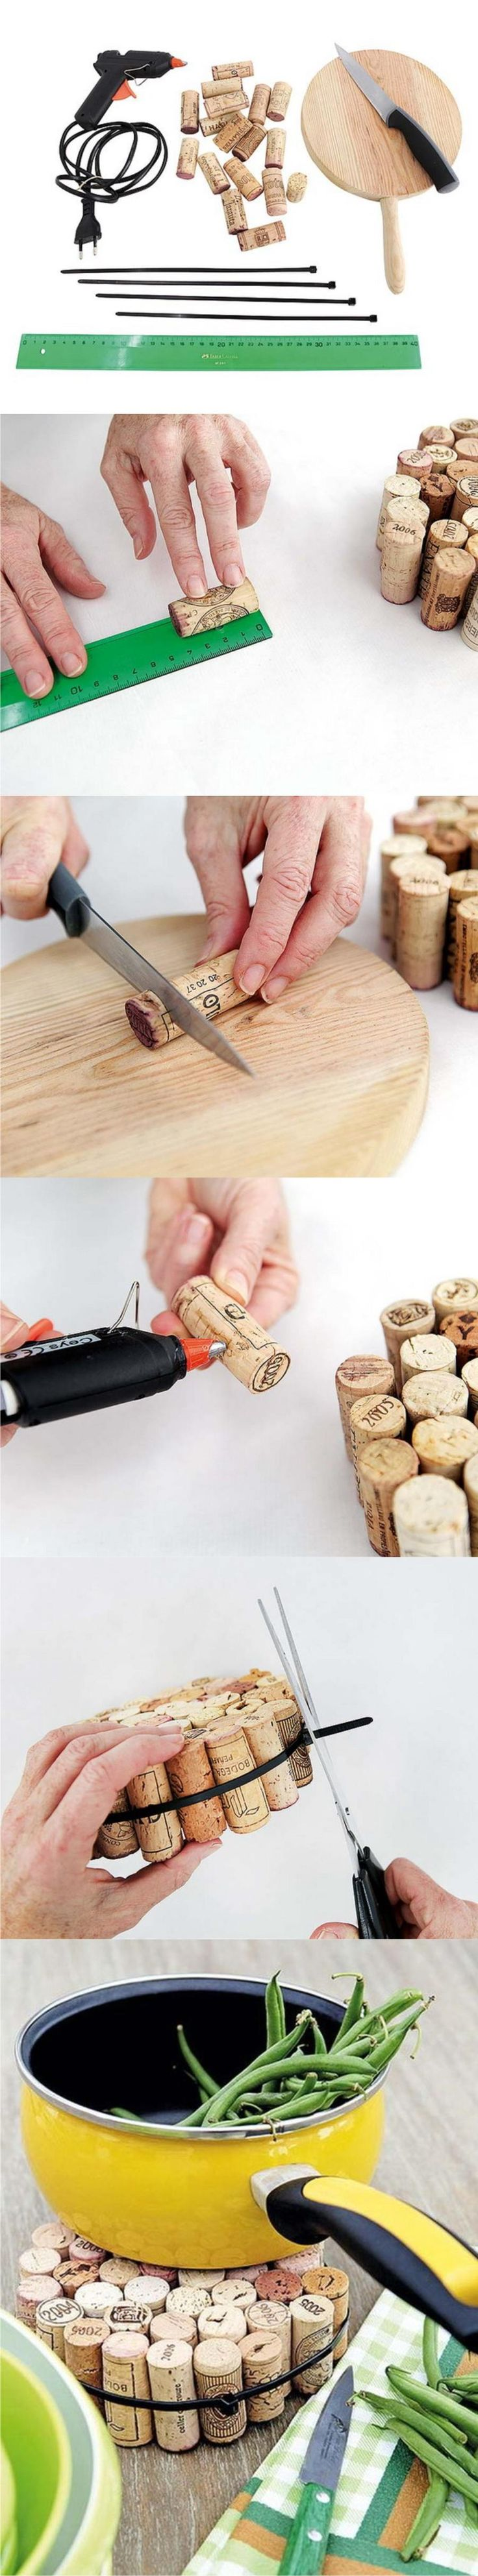 Salvamanteles con tapones de corcho - homekit.com - DIY Wine Cork Mat